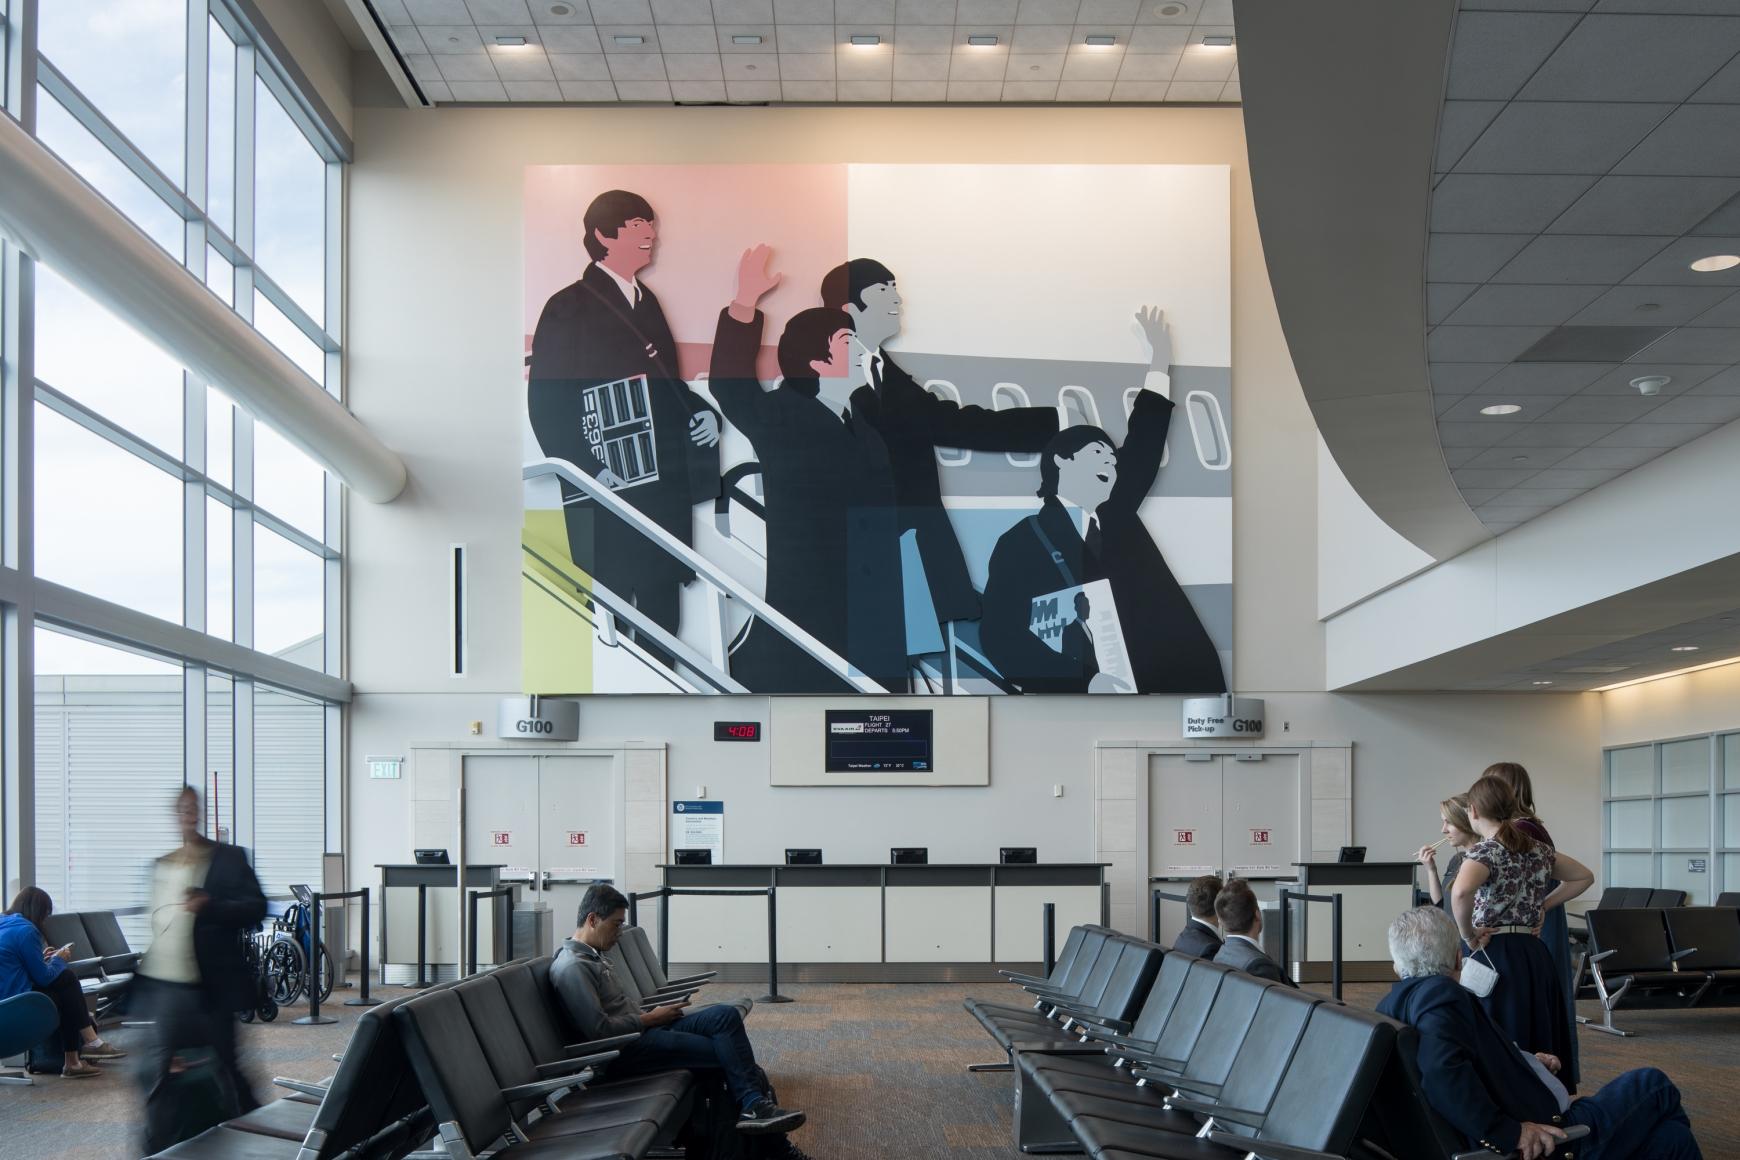 Kota Ezawa, Mondrian Meets the Beatles , San Francisco International Airport, International Terminal, Gate G100.Photo: Ethan Kaplan Photography, 2017. Courtesy of the San Francisco Arts Commission